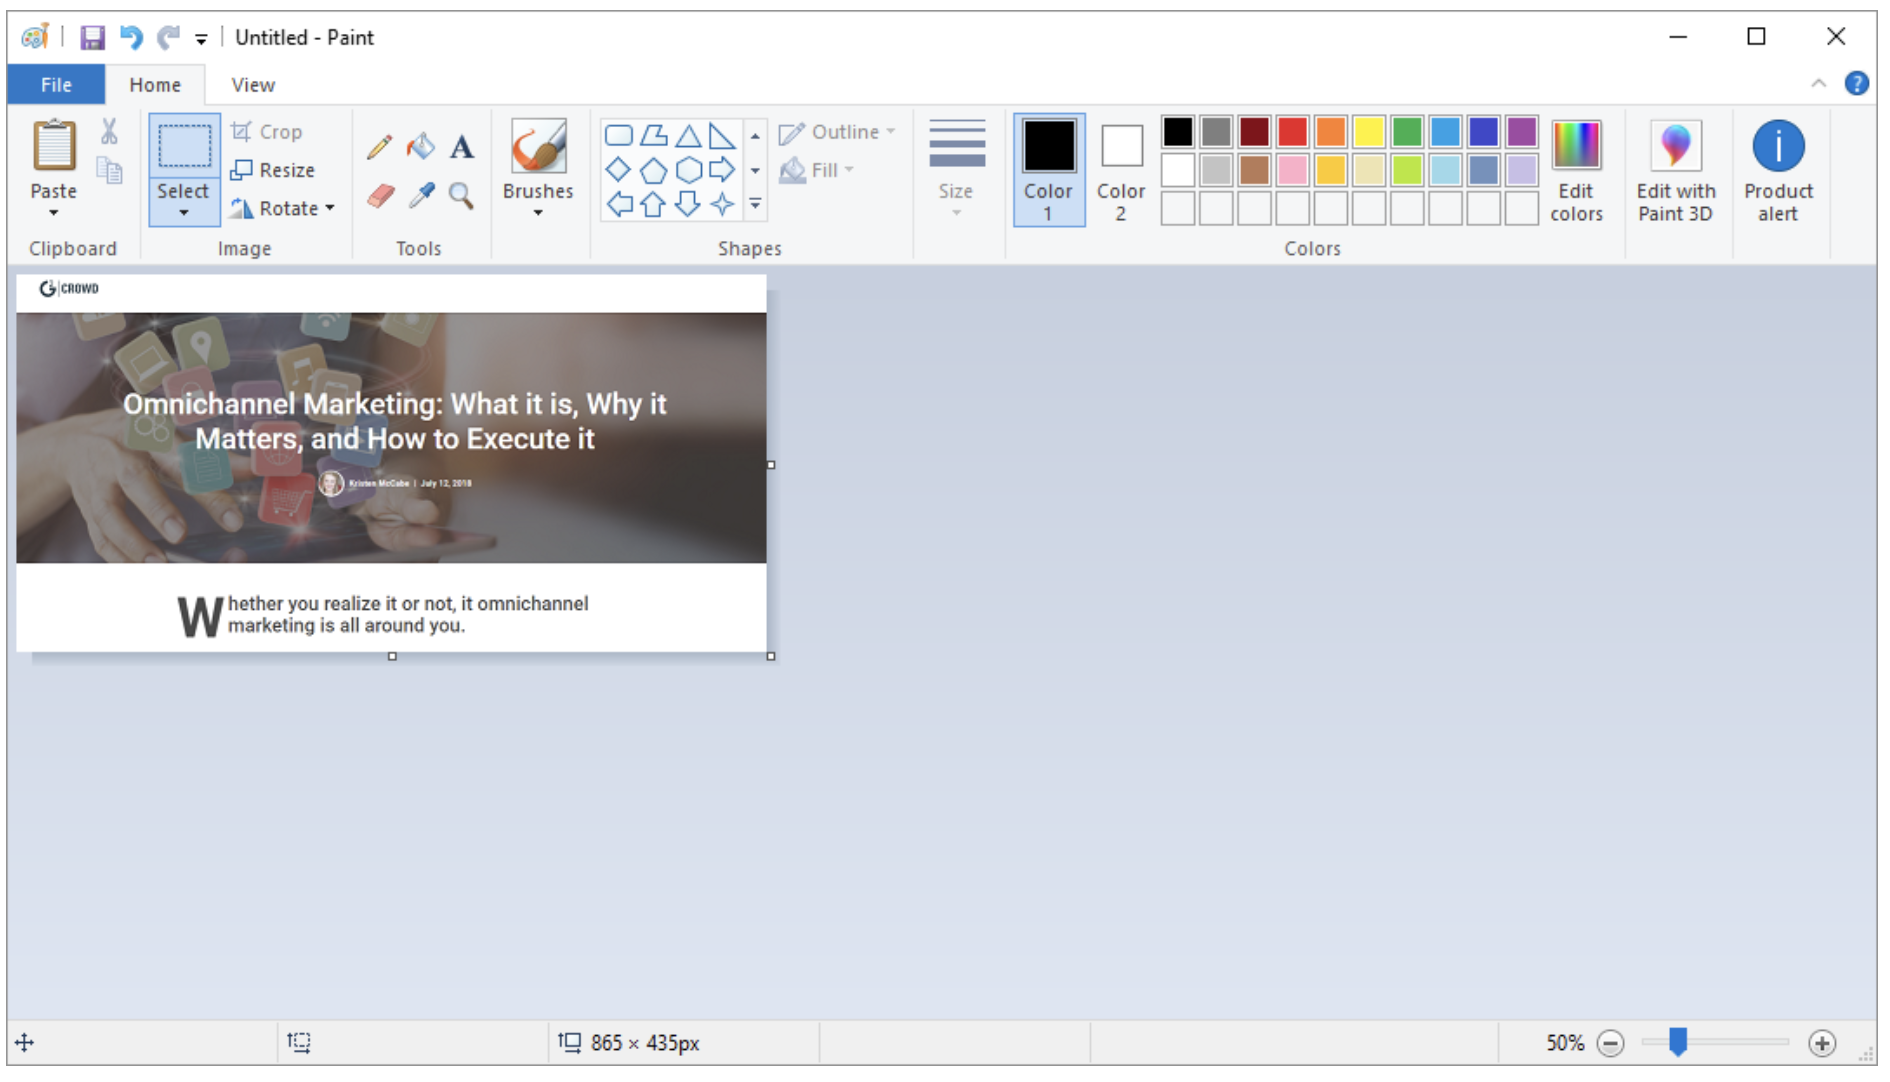 cropped-windows-screenshot-microsoft-paint